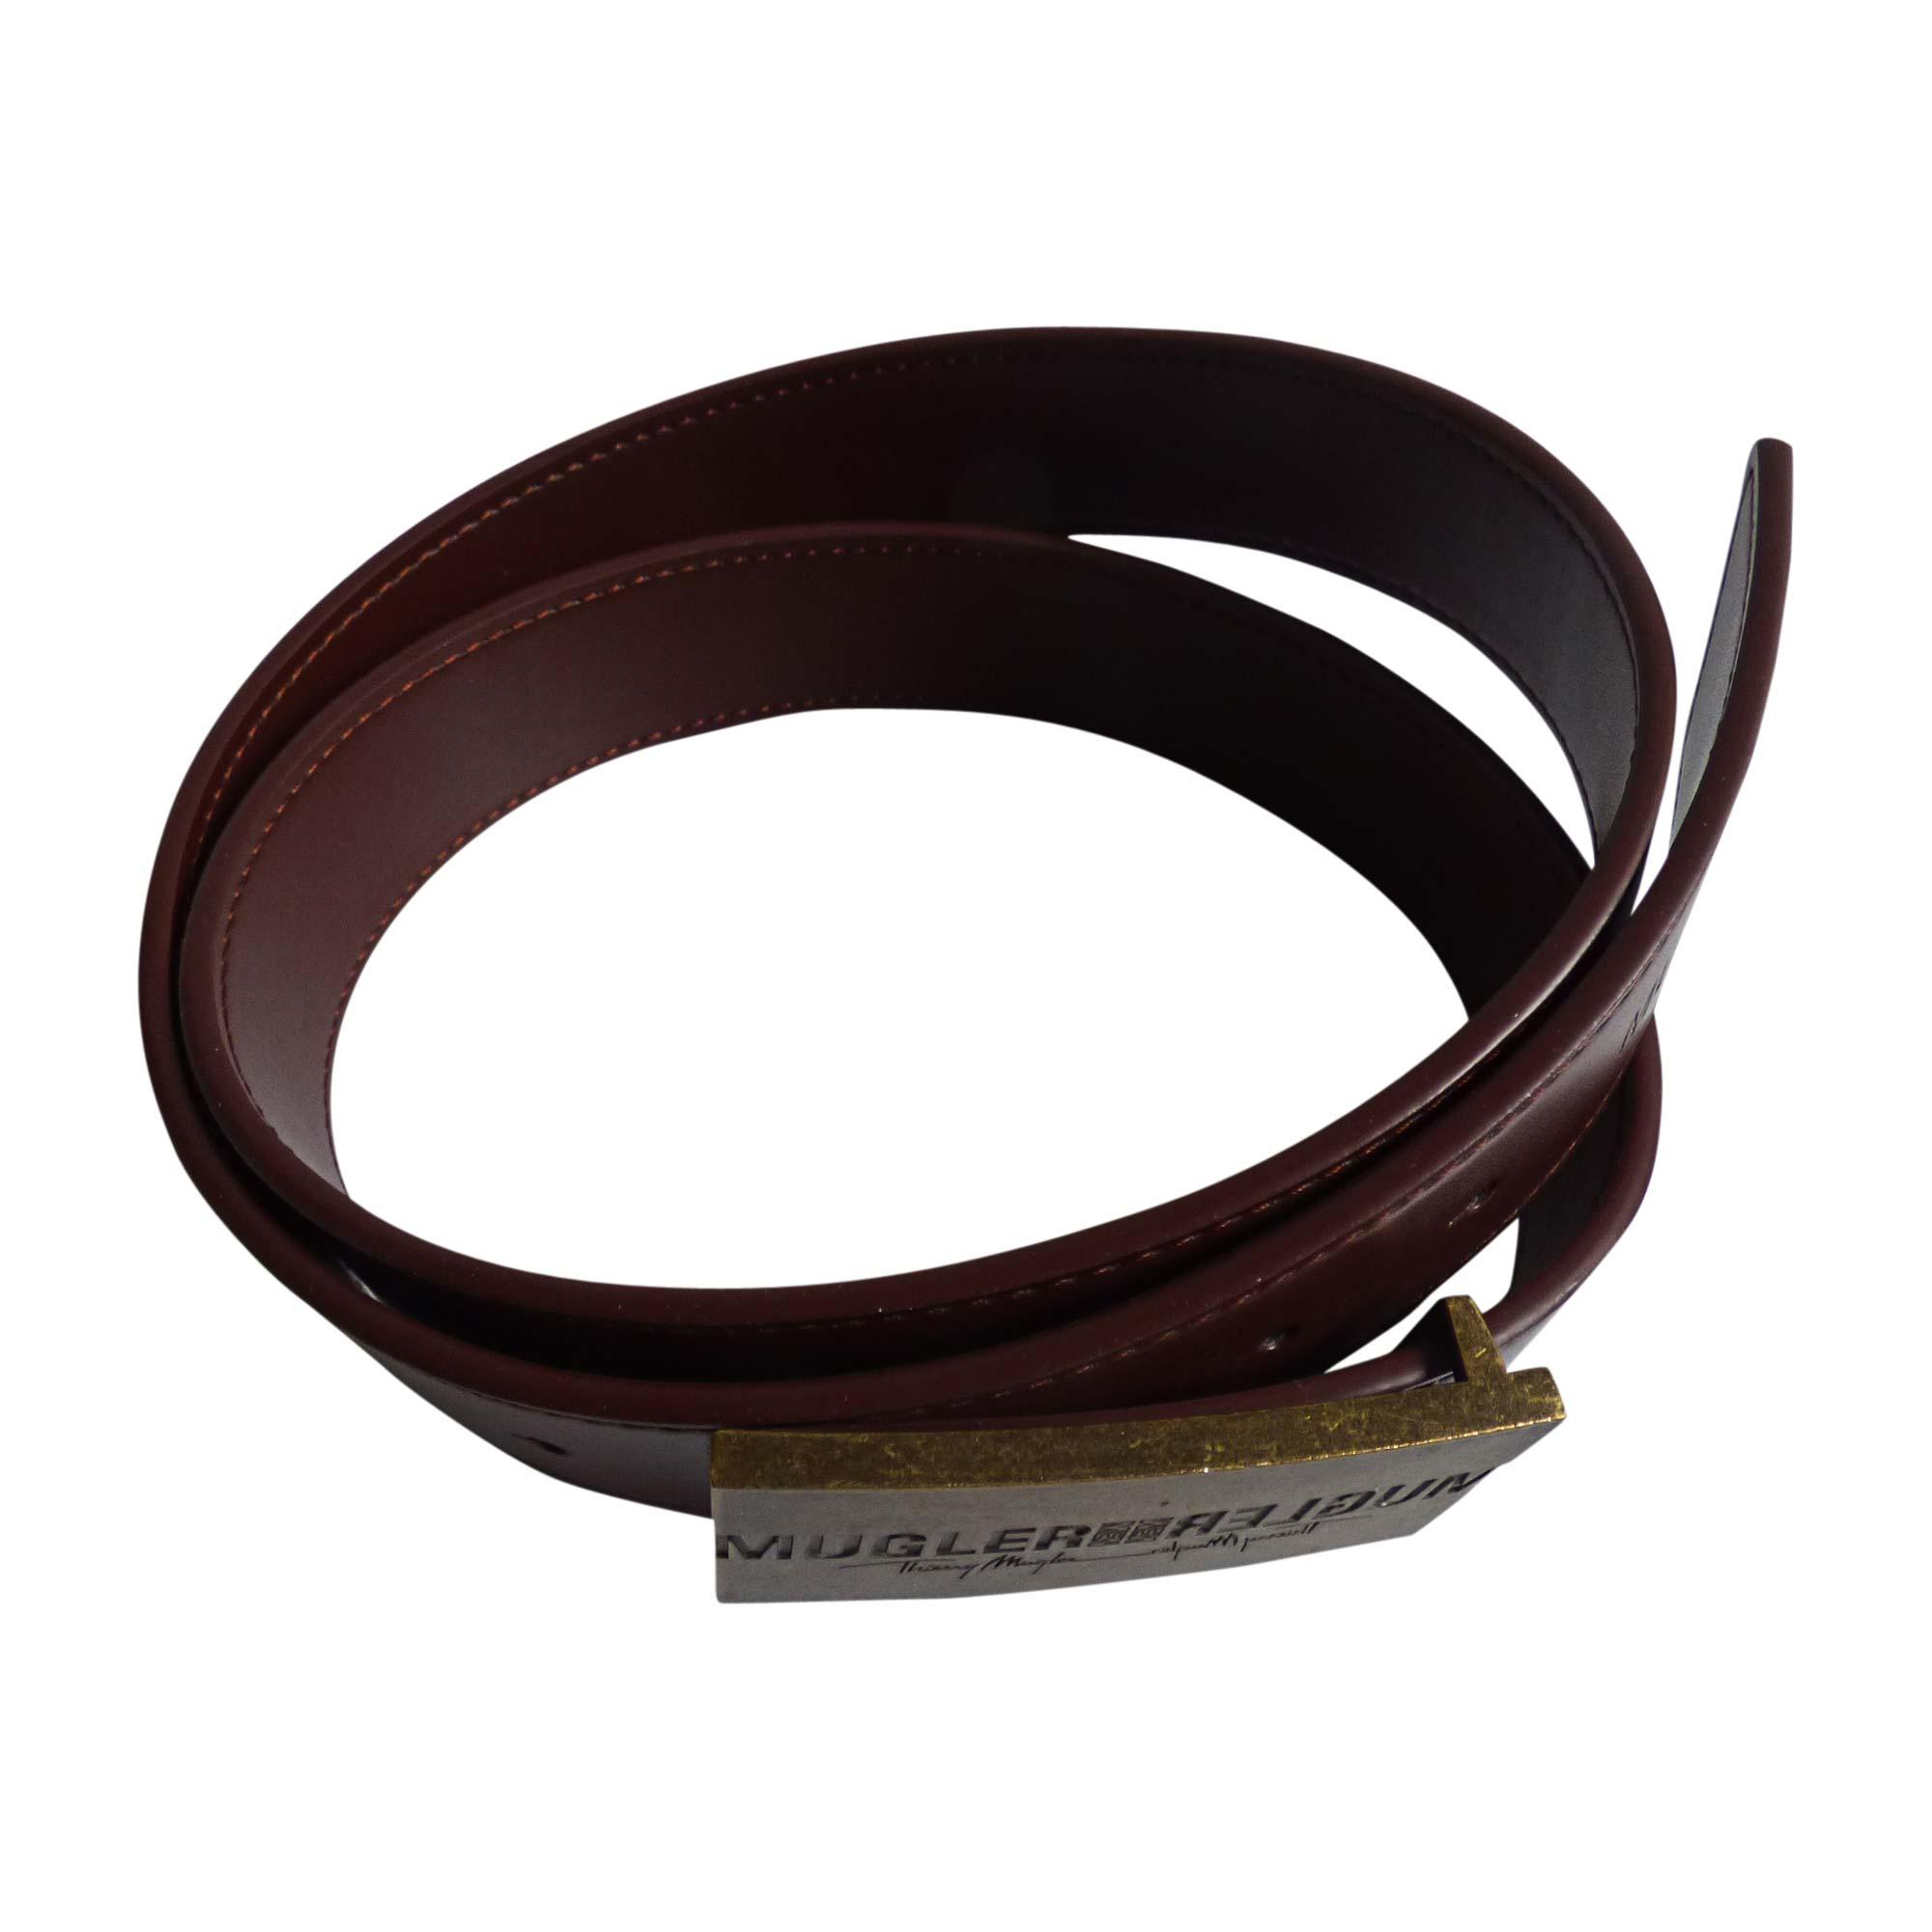 Cintura THIERRY MUGLER Marrone